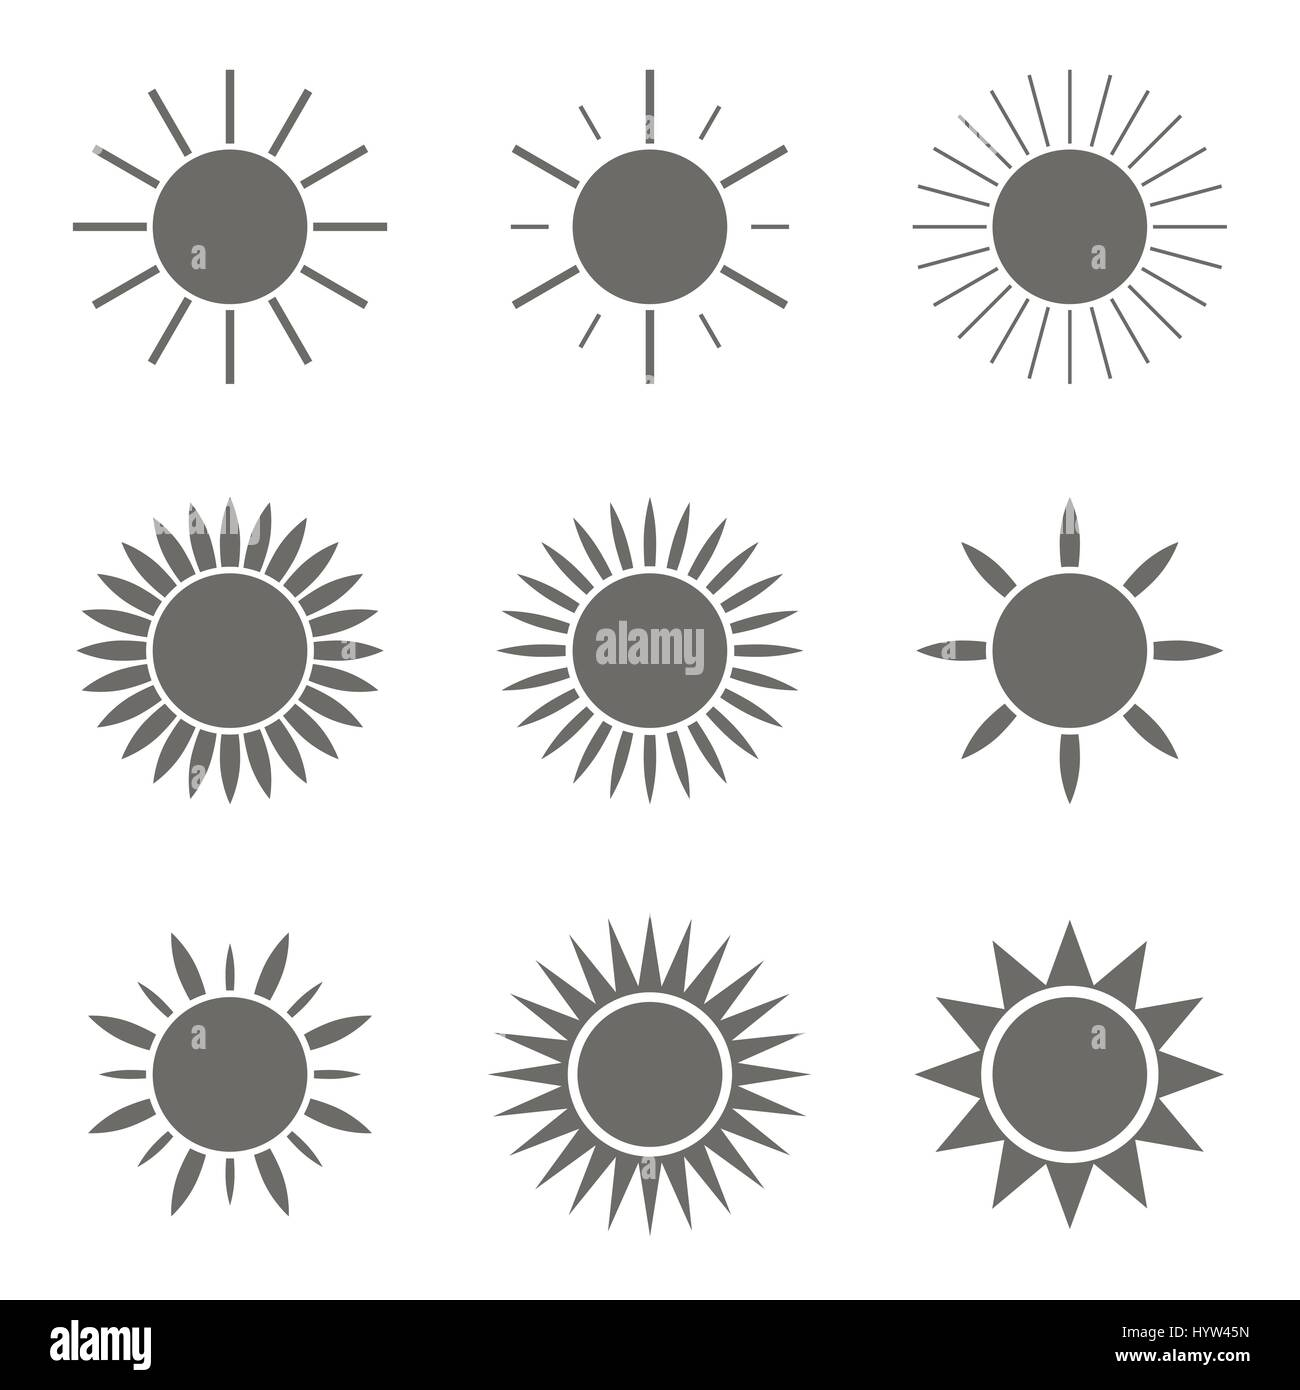 Sun icon set - Stock Image